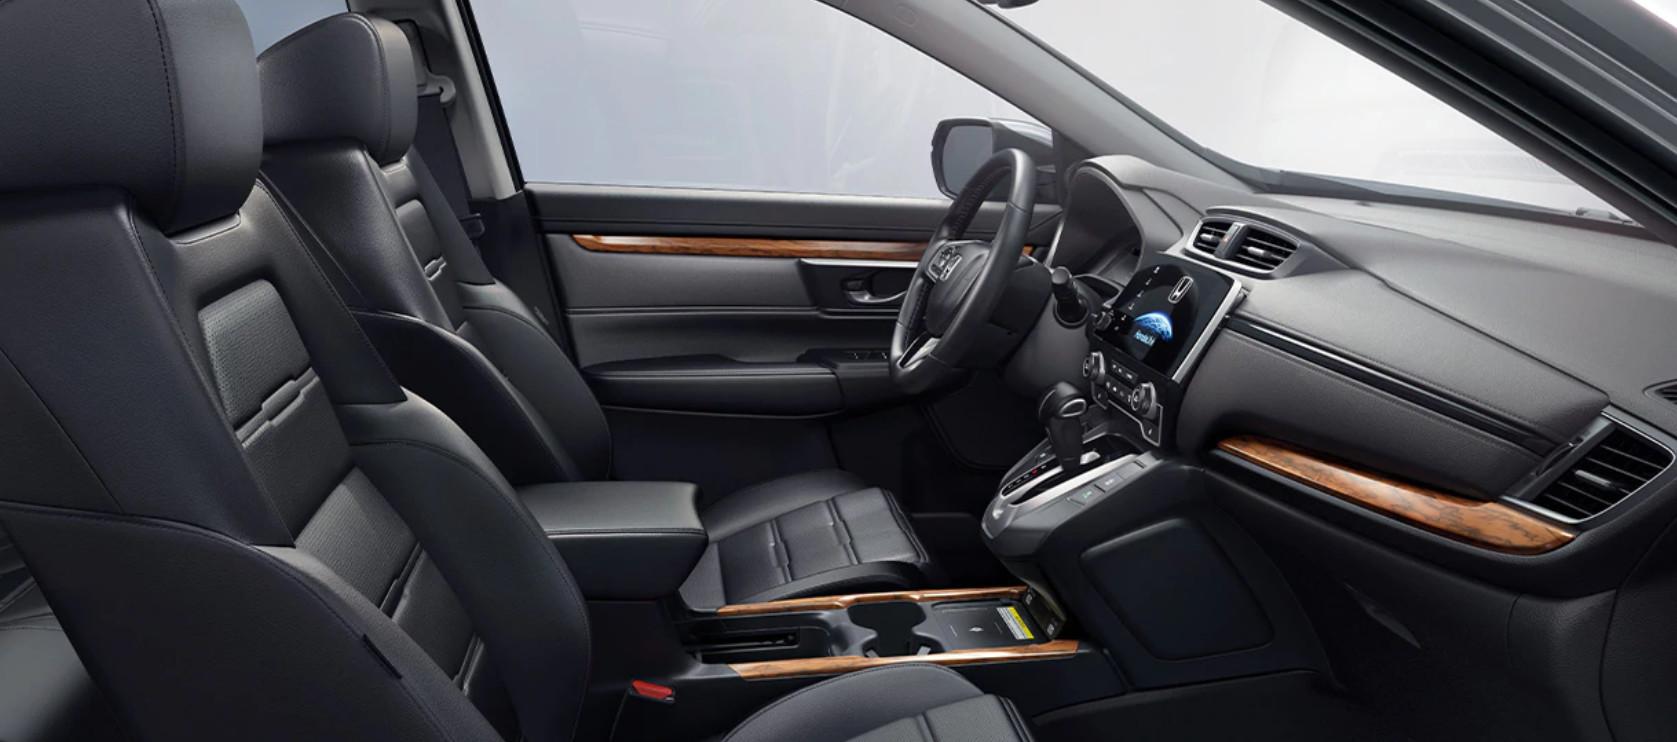 2020 Honda CR-V Available Power Driver's Seat